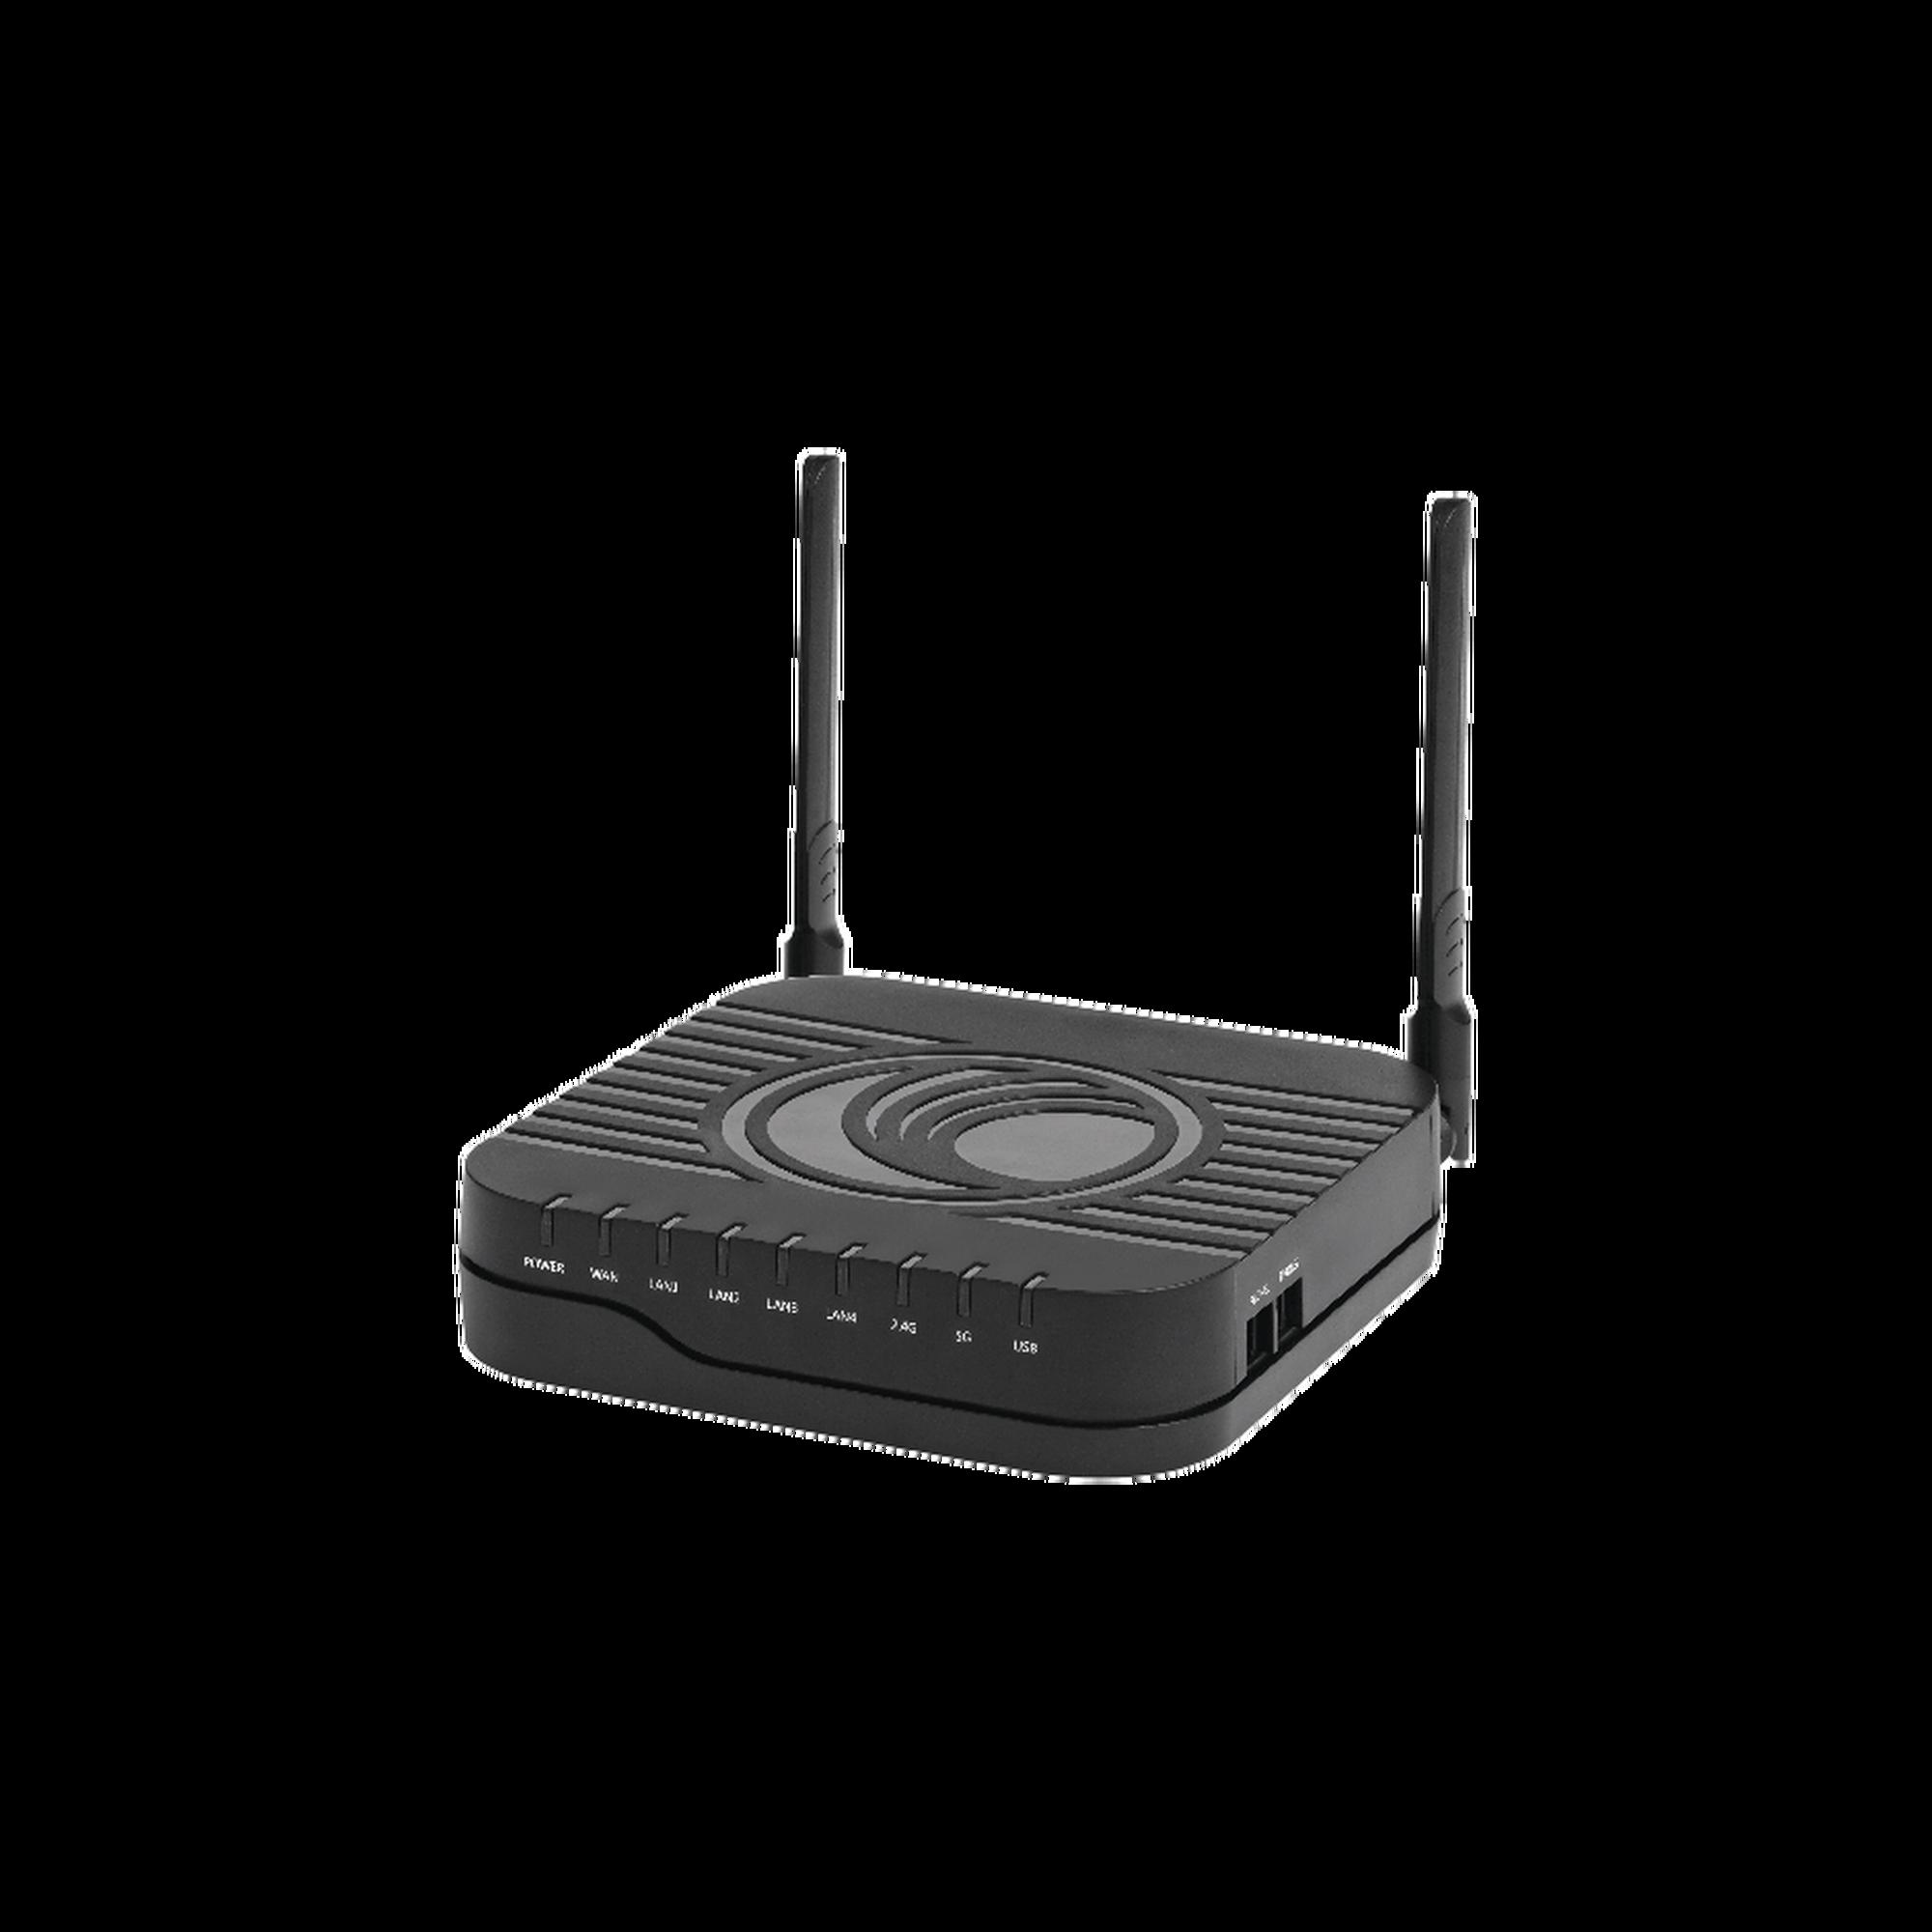 C000000L050A - Ruteador inalambrico 802.11ac 2.4/5 GHz con Administracion Cloud +  Salida PoE para Suscriptor (C000000L030A)